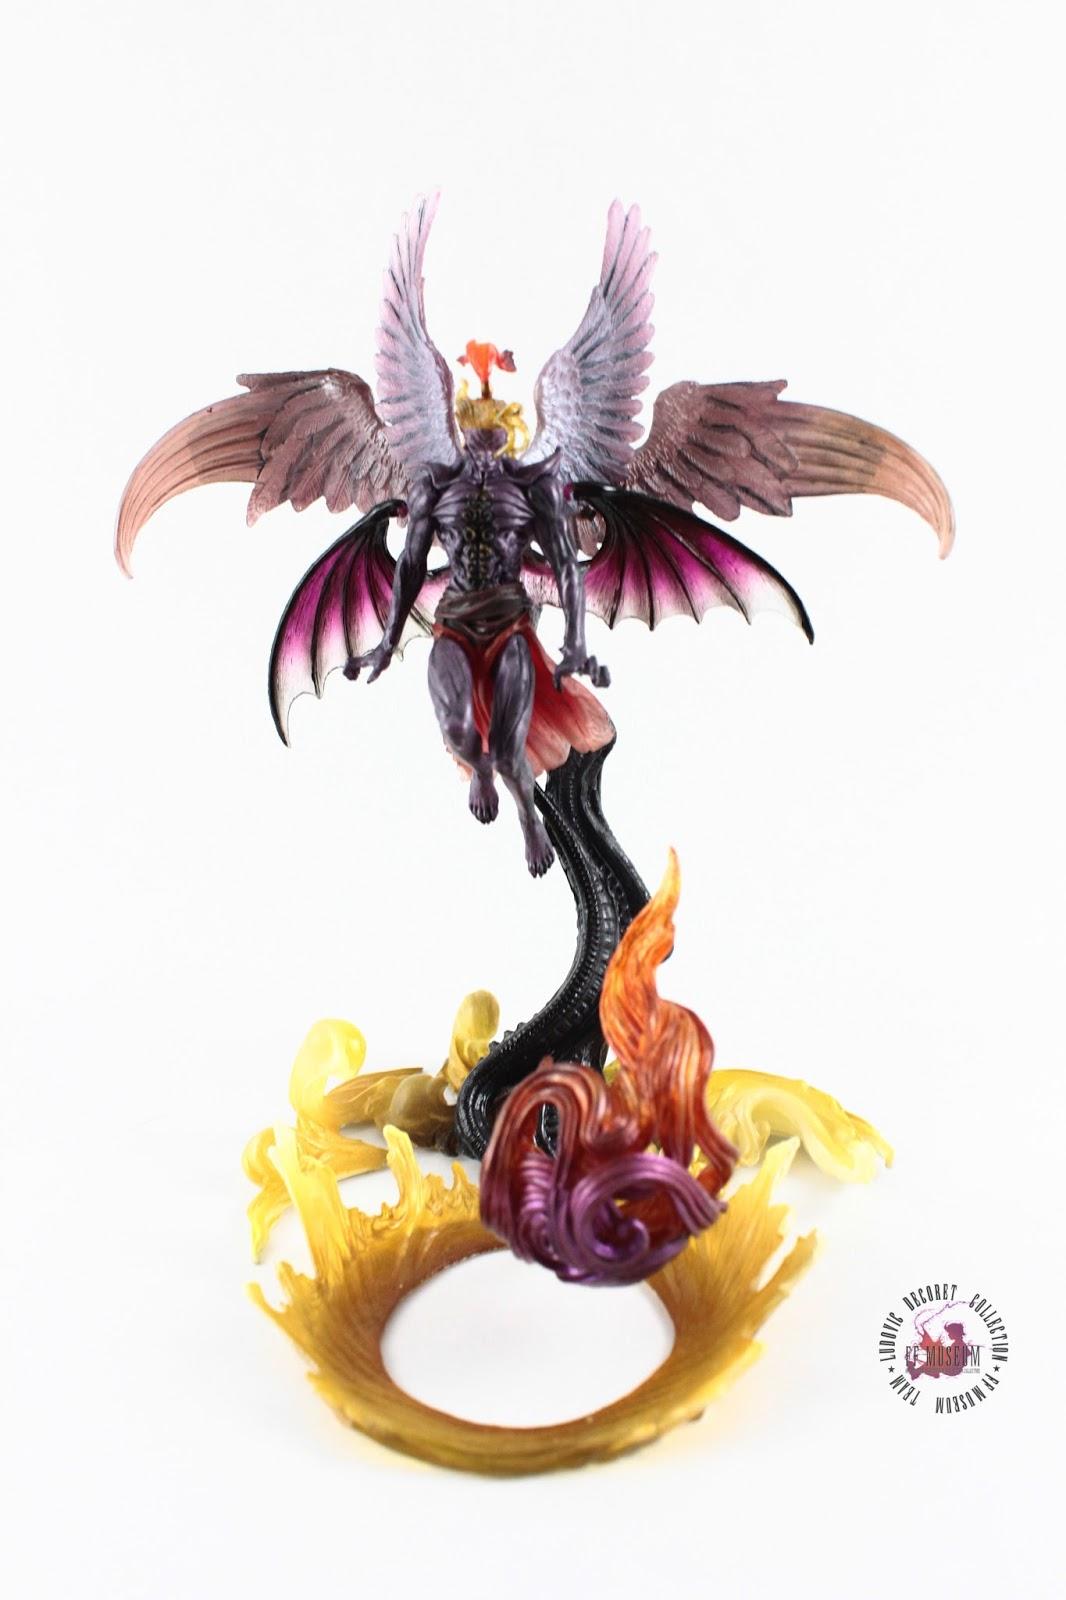 Final fantasy master creatures kefka figure